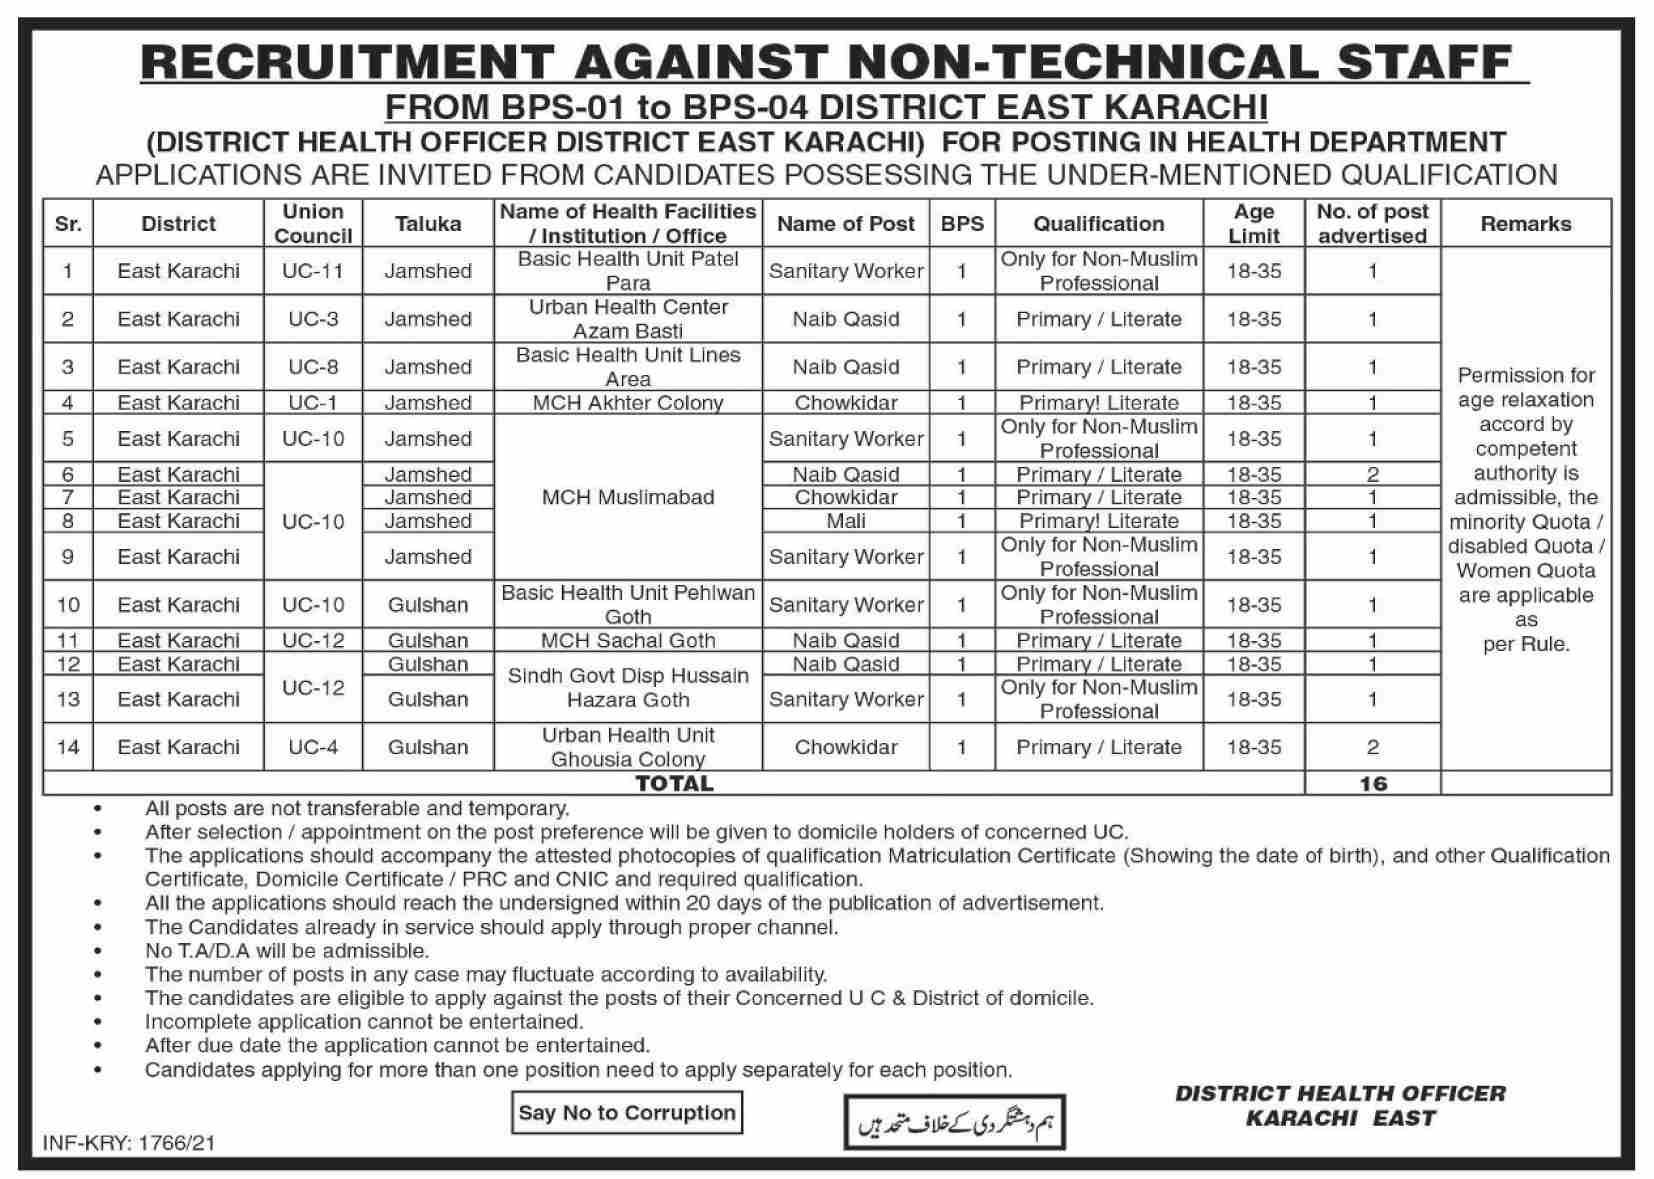 Health Department Jobs 2021 For Non-Technical Staff in Karachi